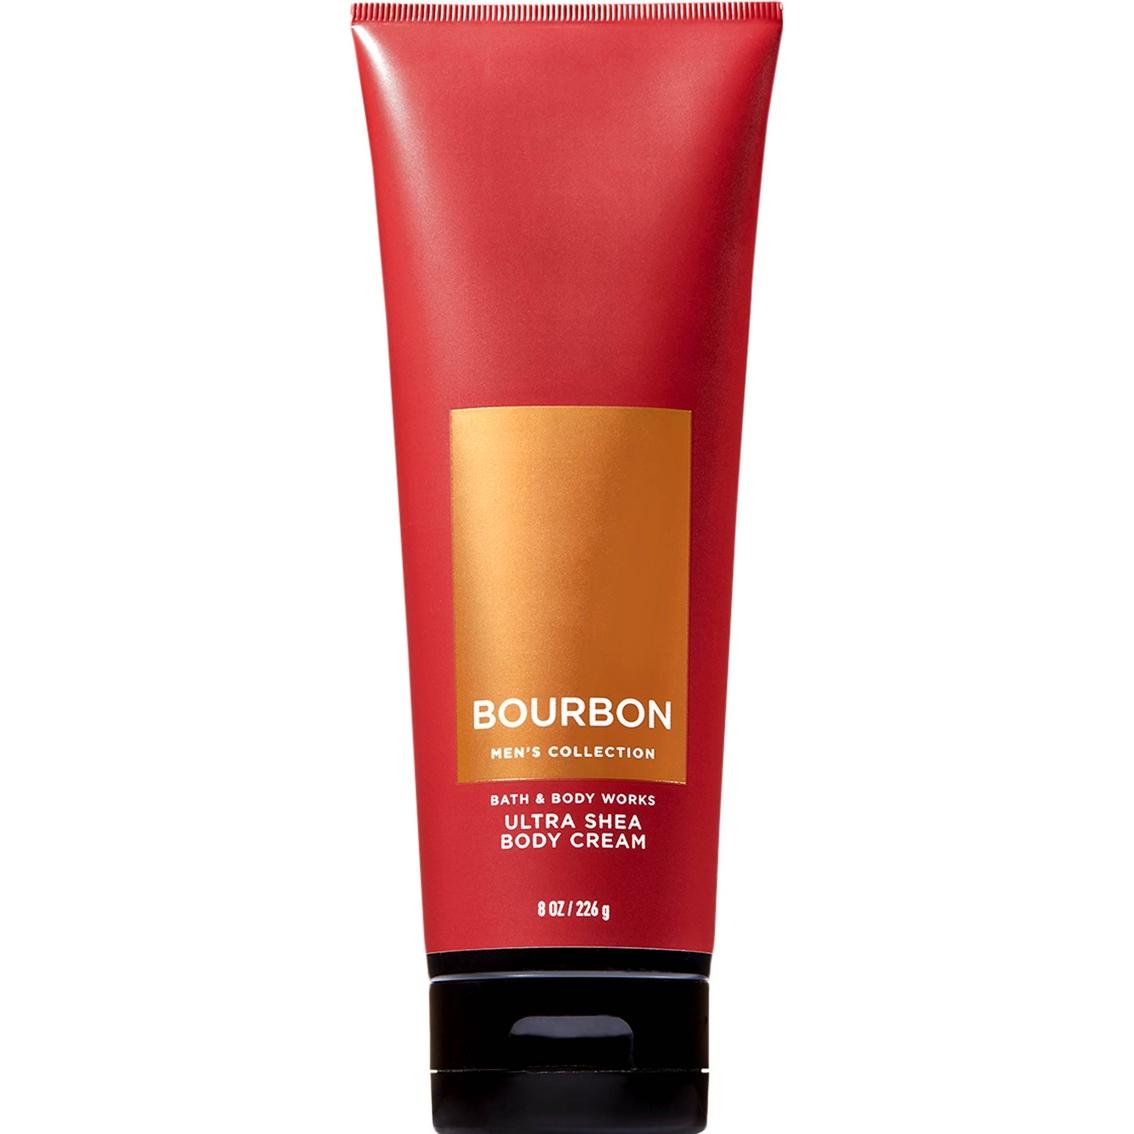 292638edfe Bath & Body Works Men's Collection Bourbon Body Cream | Body & Hair ...